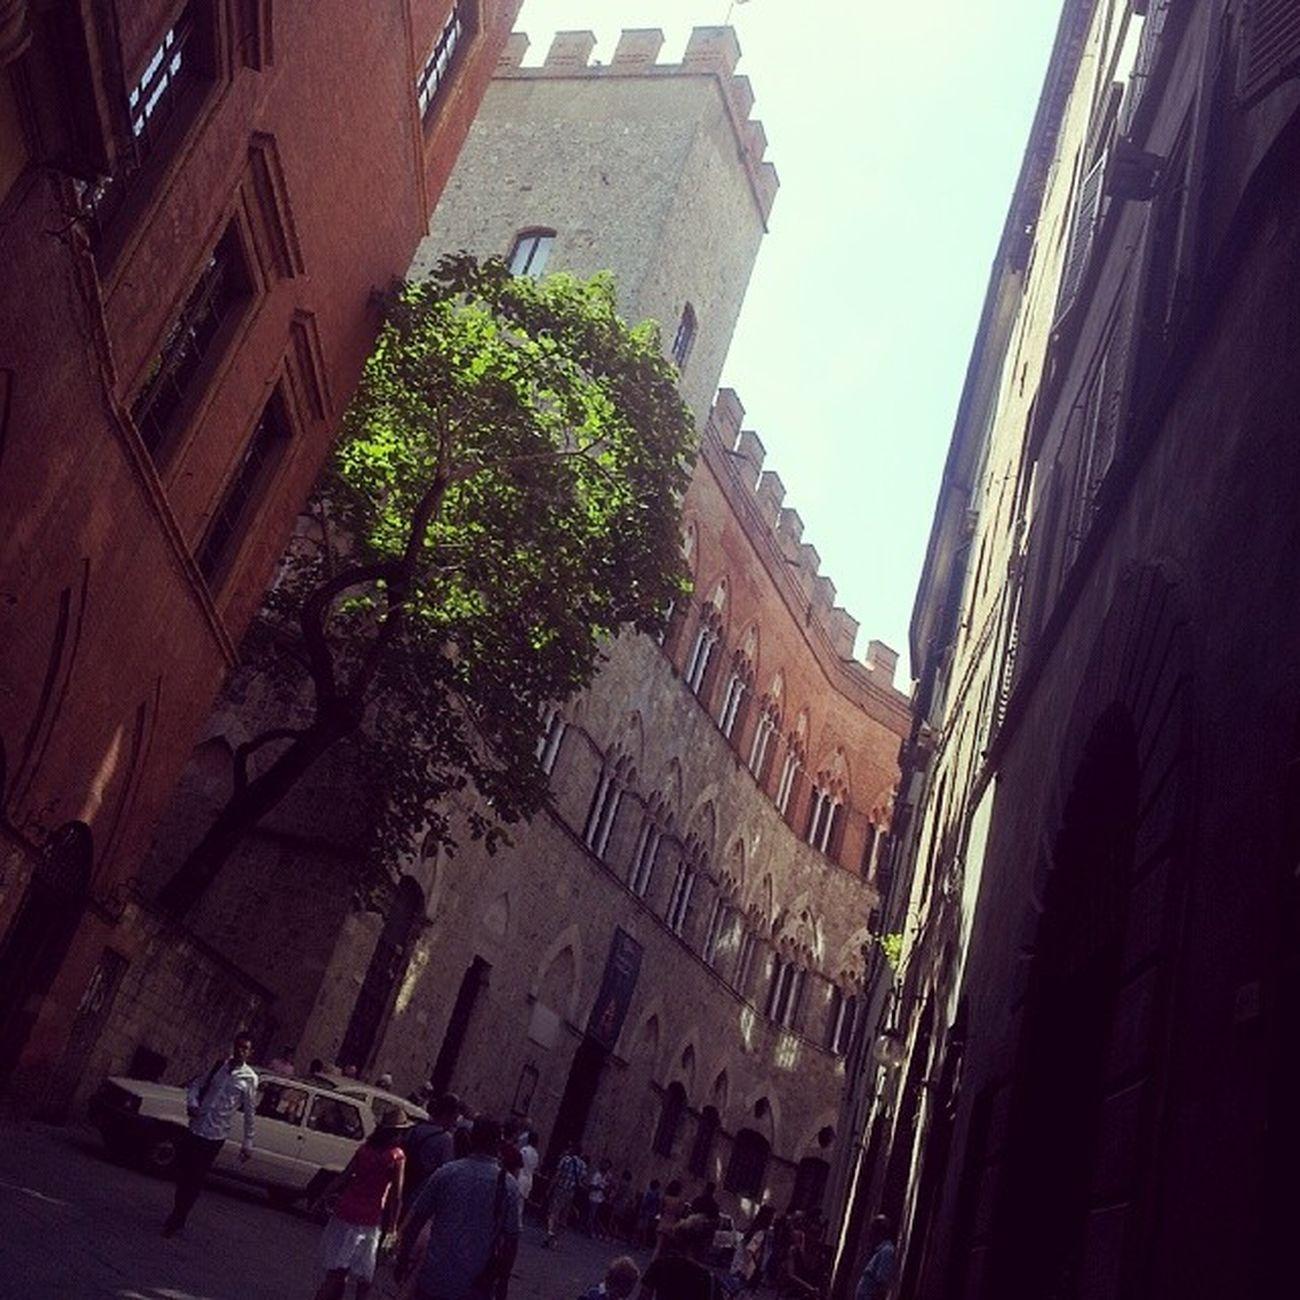 Beautiful Tuscany Tuscany Siena Sangiminiano Volterra medioevo medievaltimes citytour landscape architecture